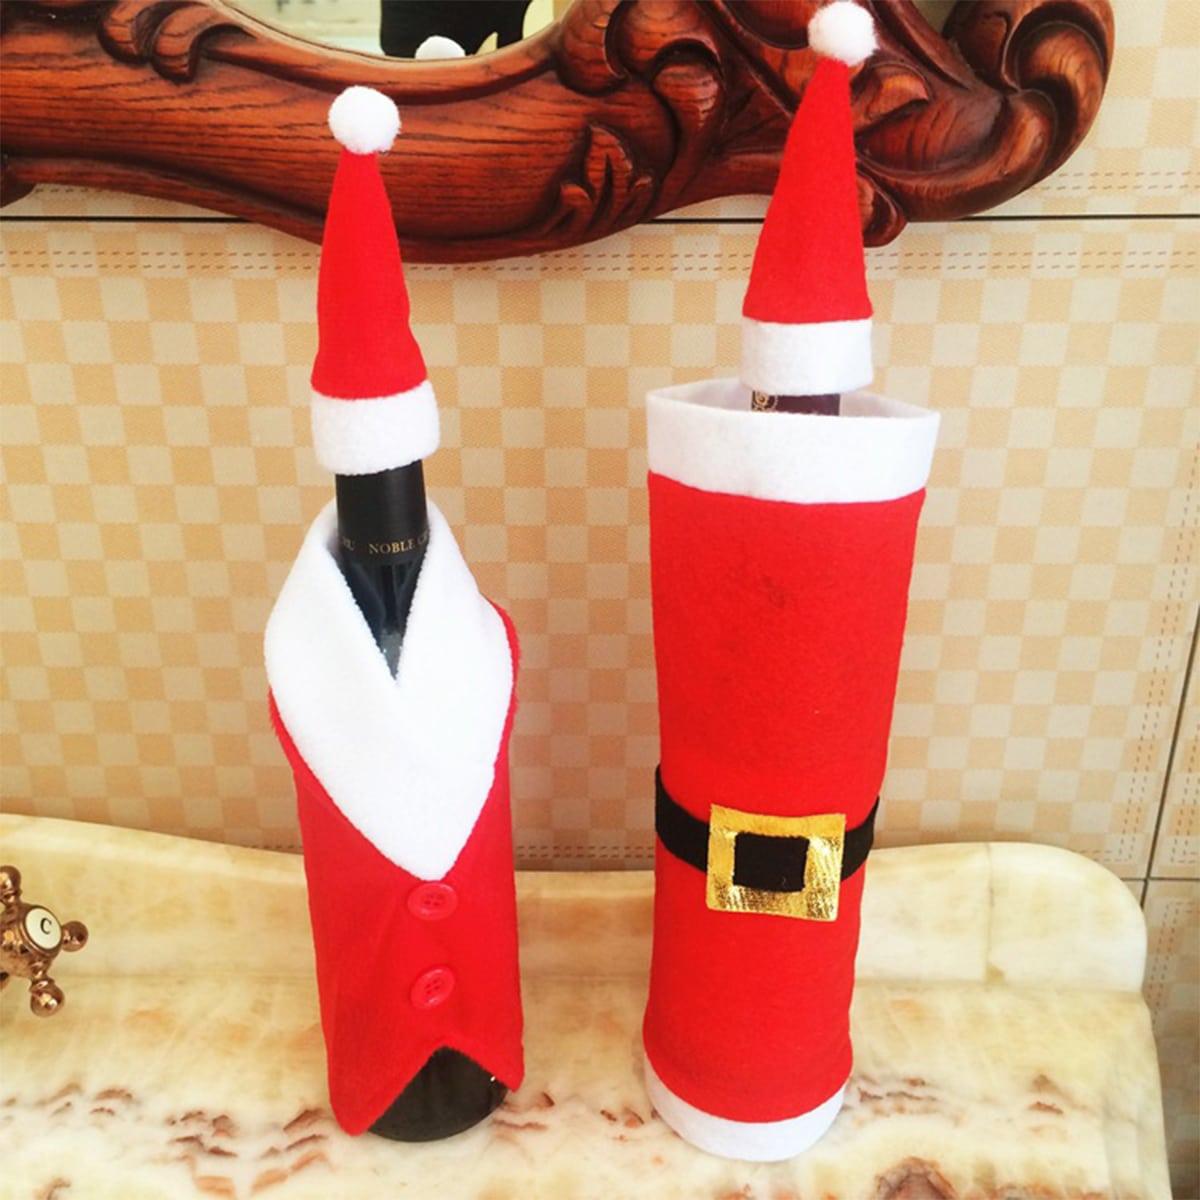 1-delige kerstfleshoes